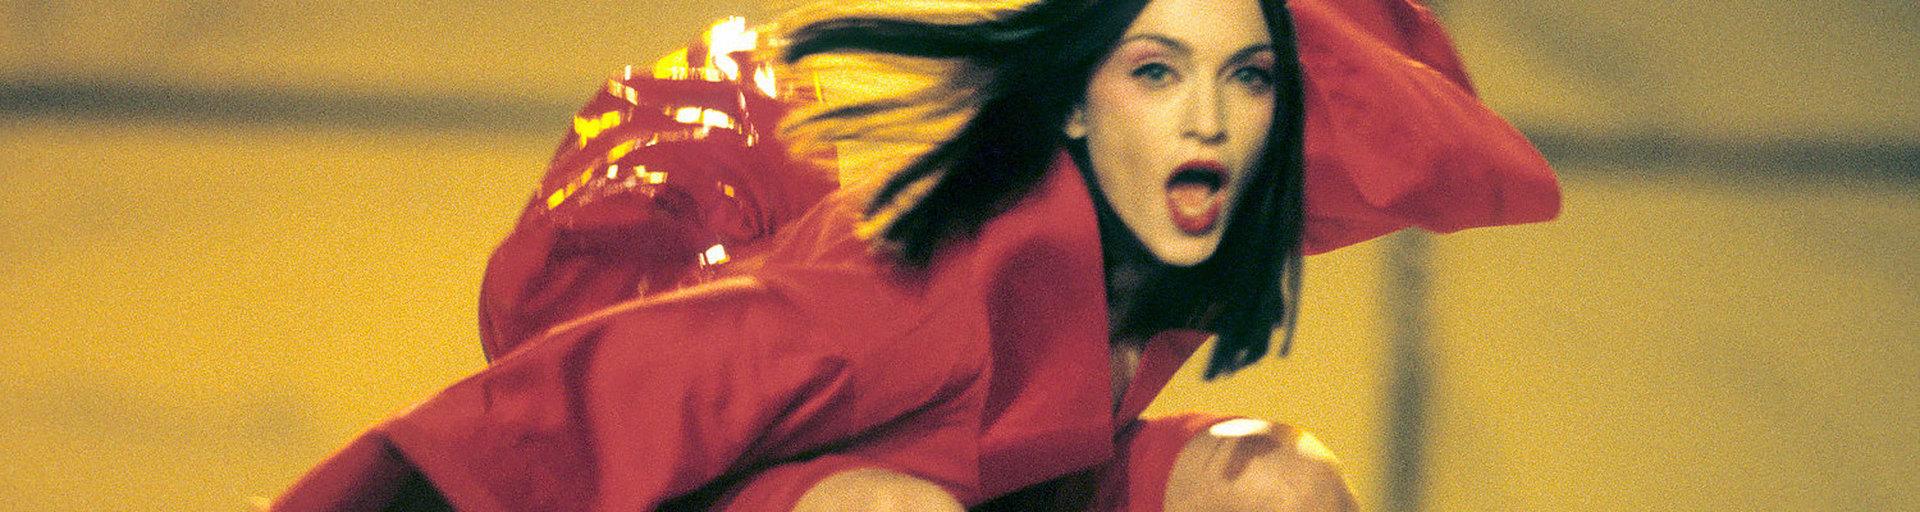 15 культовых образов Мадонны